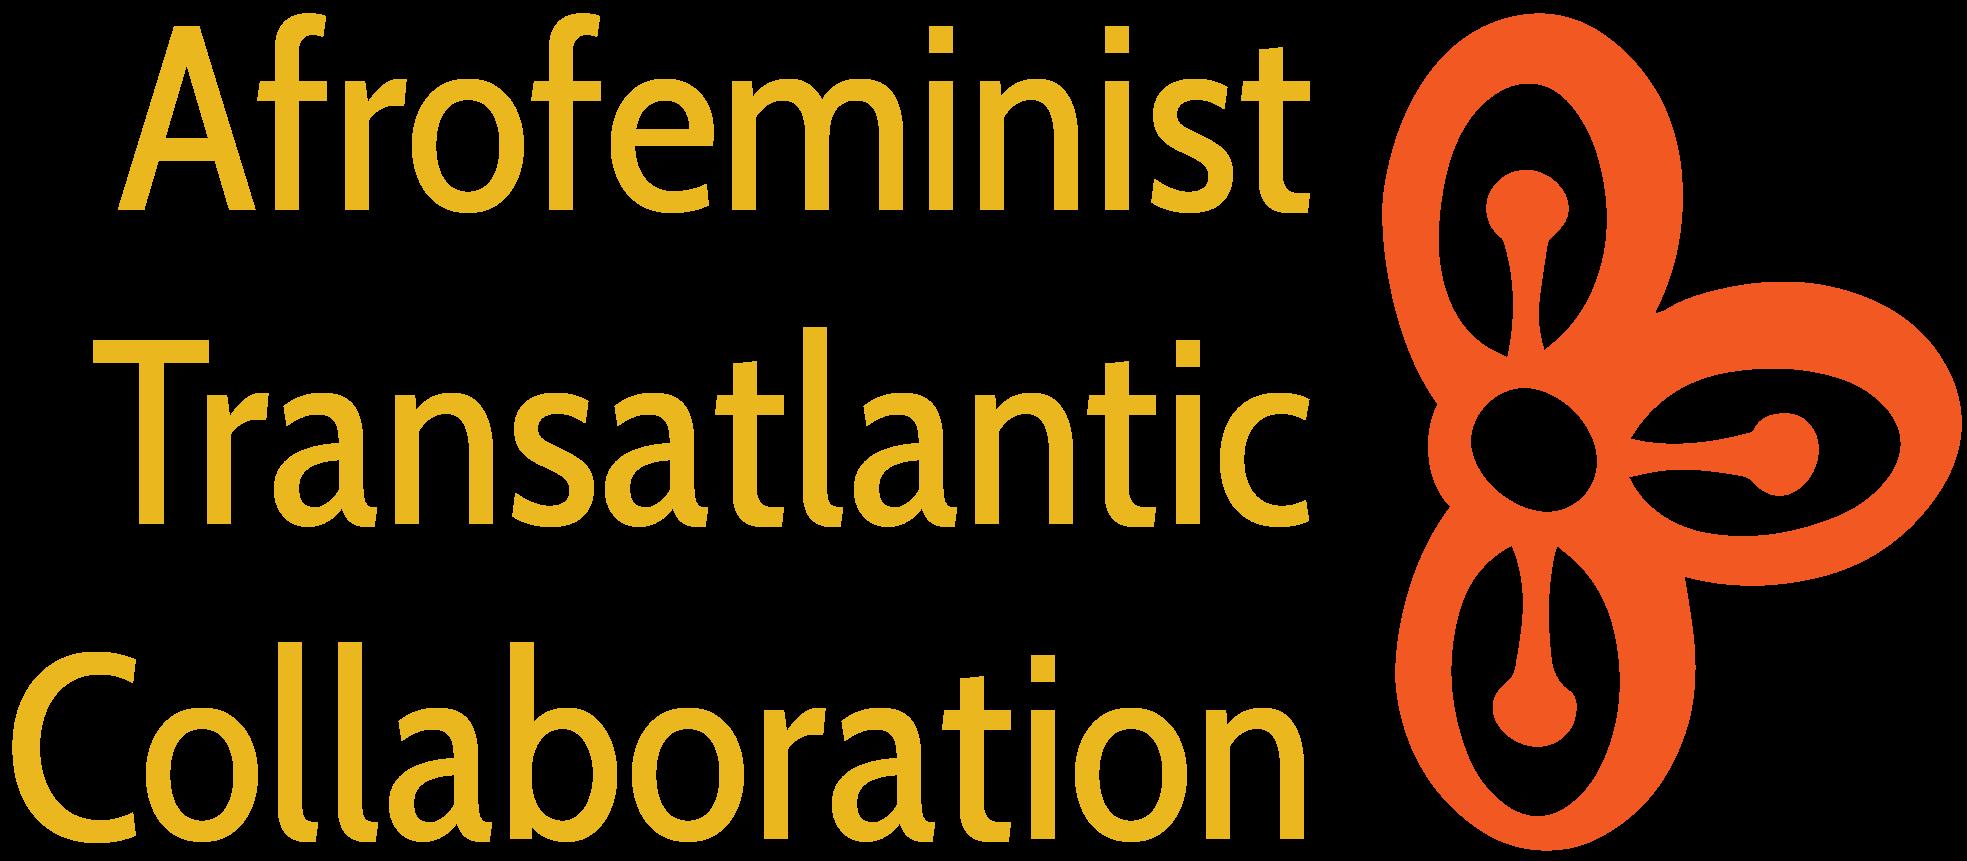 Afrofeminist Transatlantic Collaboration